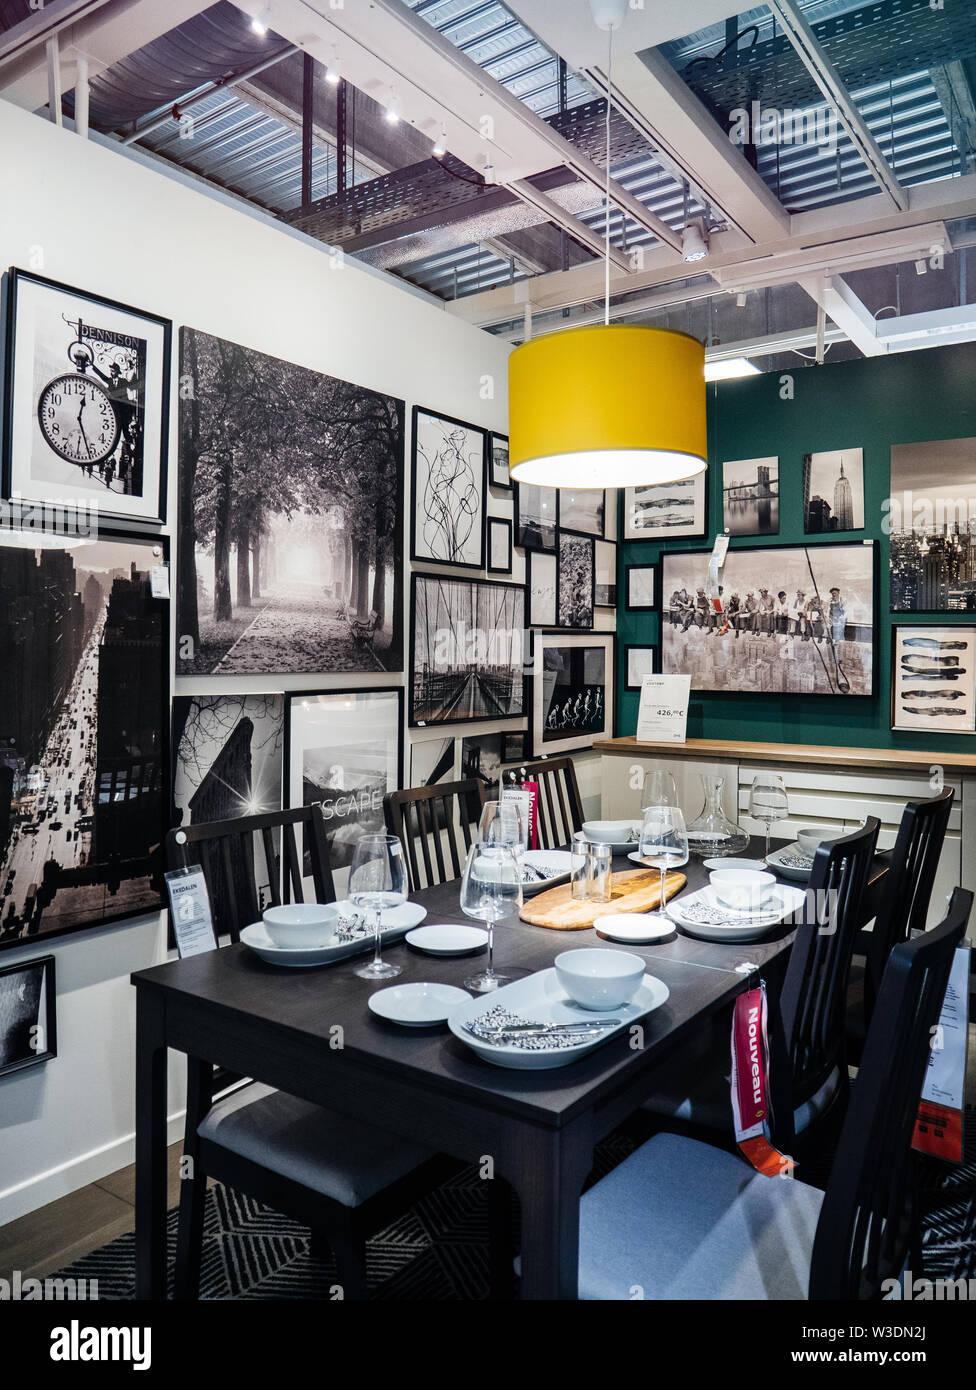 Ikea Table Photos Ikea Table Images Alamy